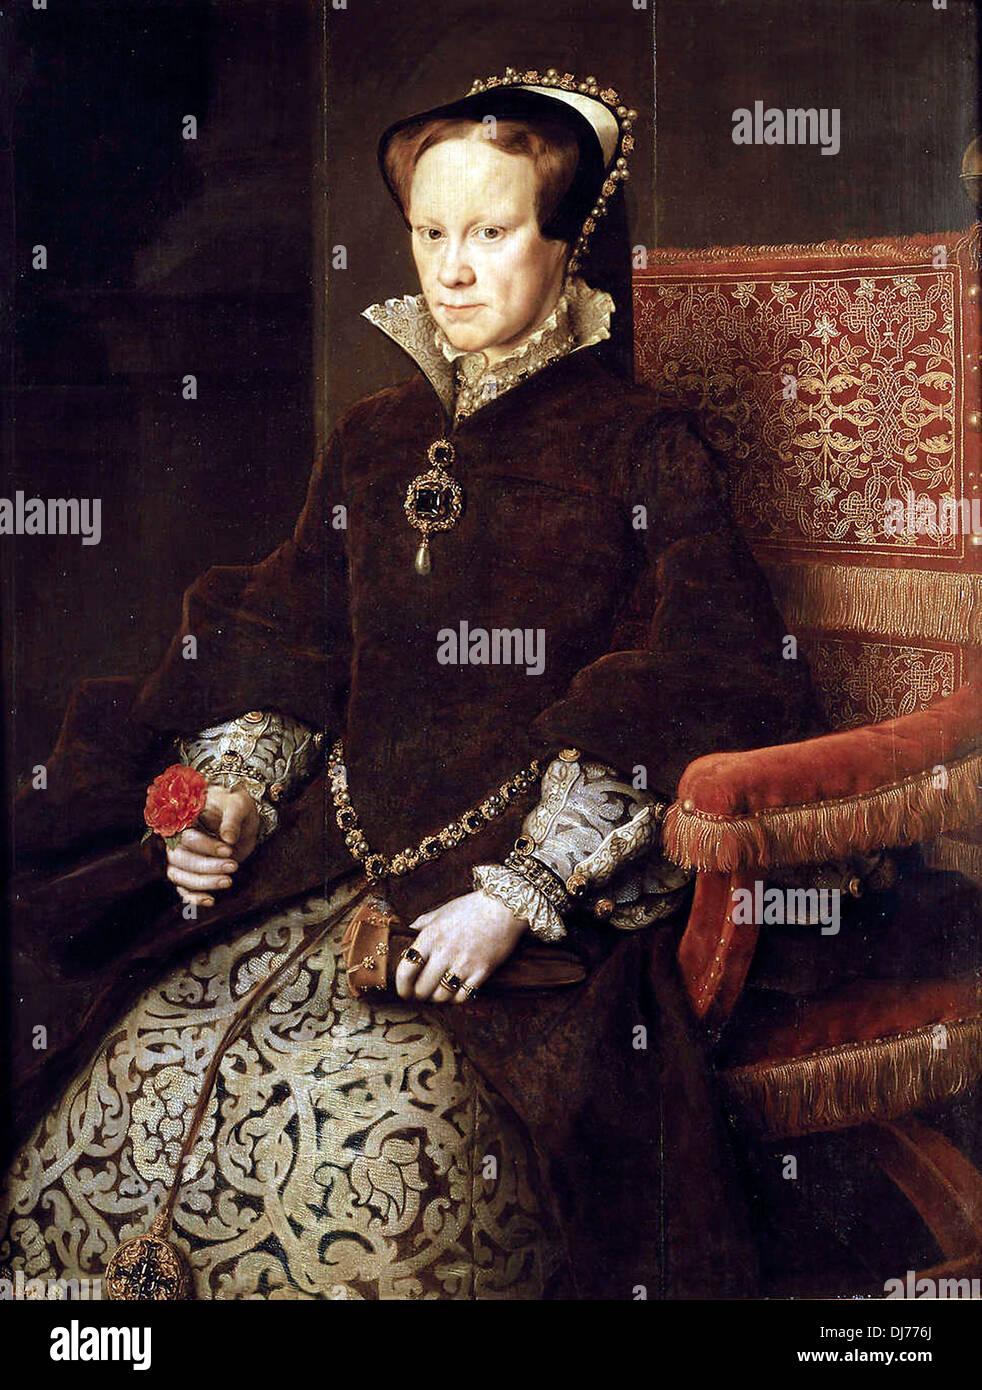 Mary Tudor, Queen of England, second wife of Felipe II - Stock Image